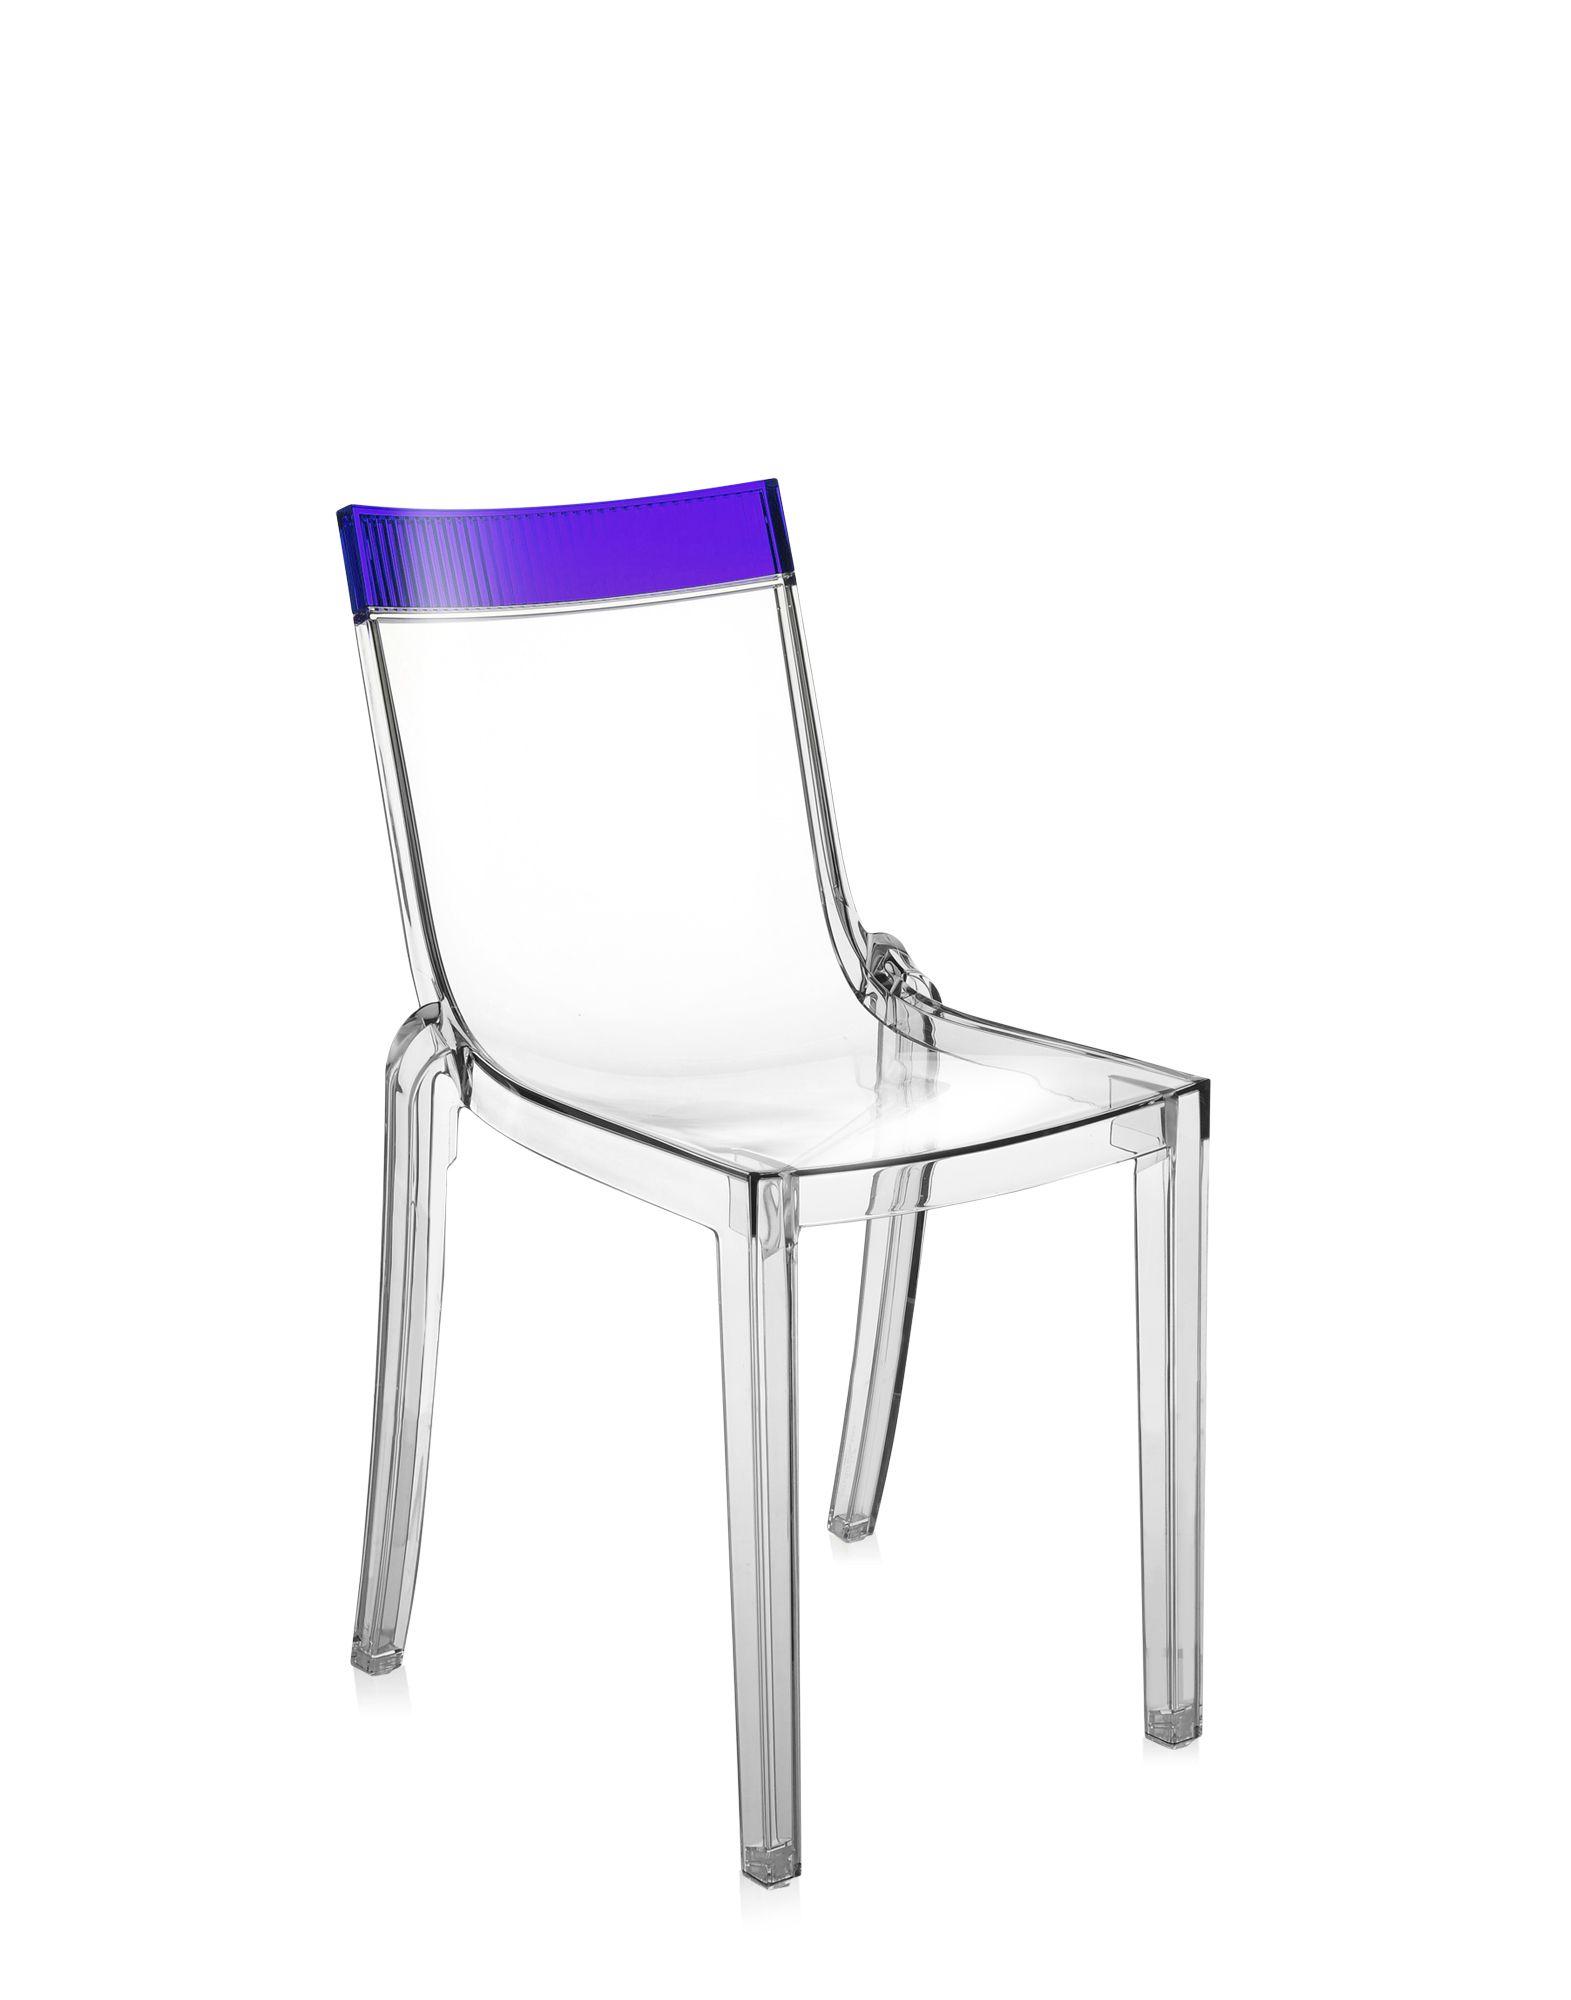 Kartell hi cut viola cristallo sedie design newformsdesign for Sedie design scontate